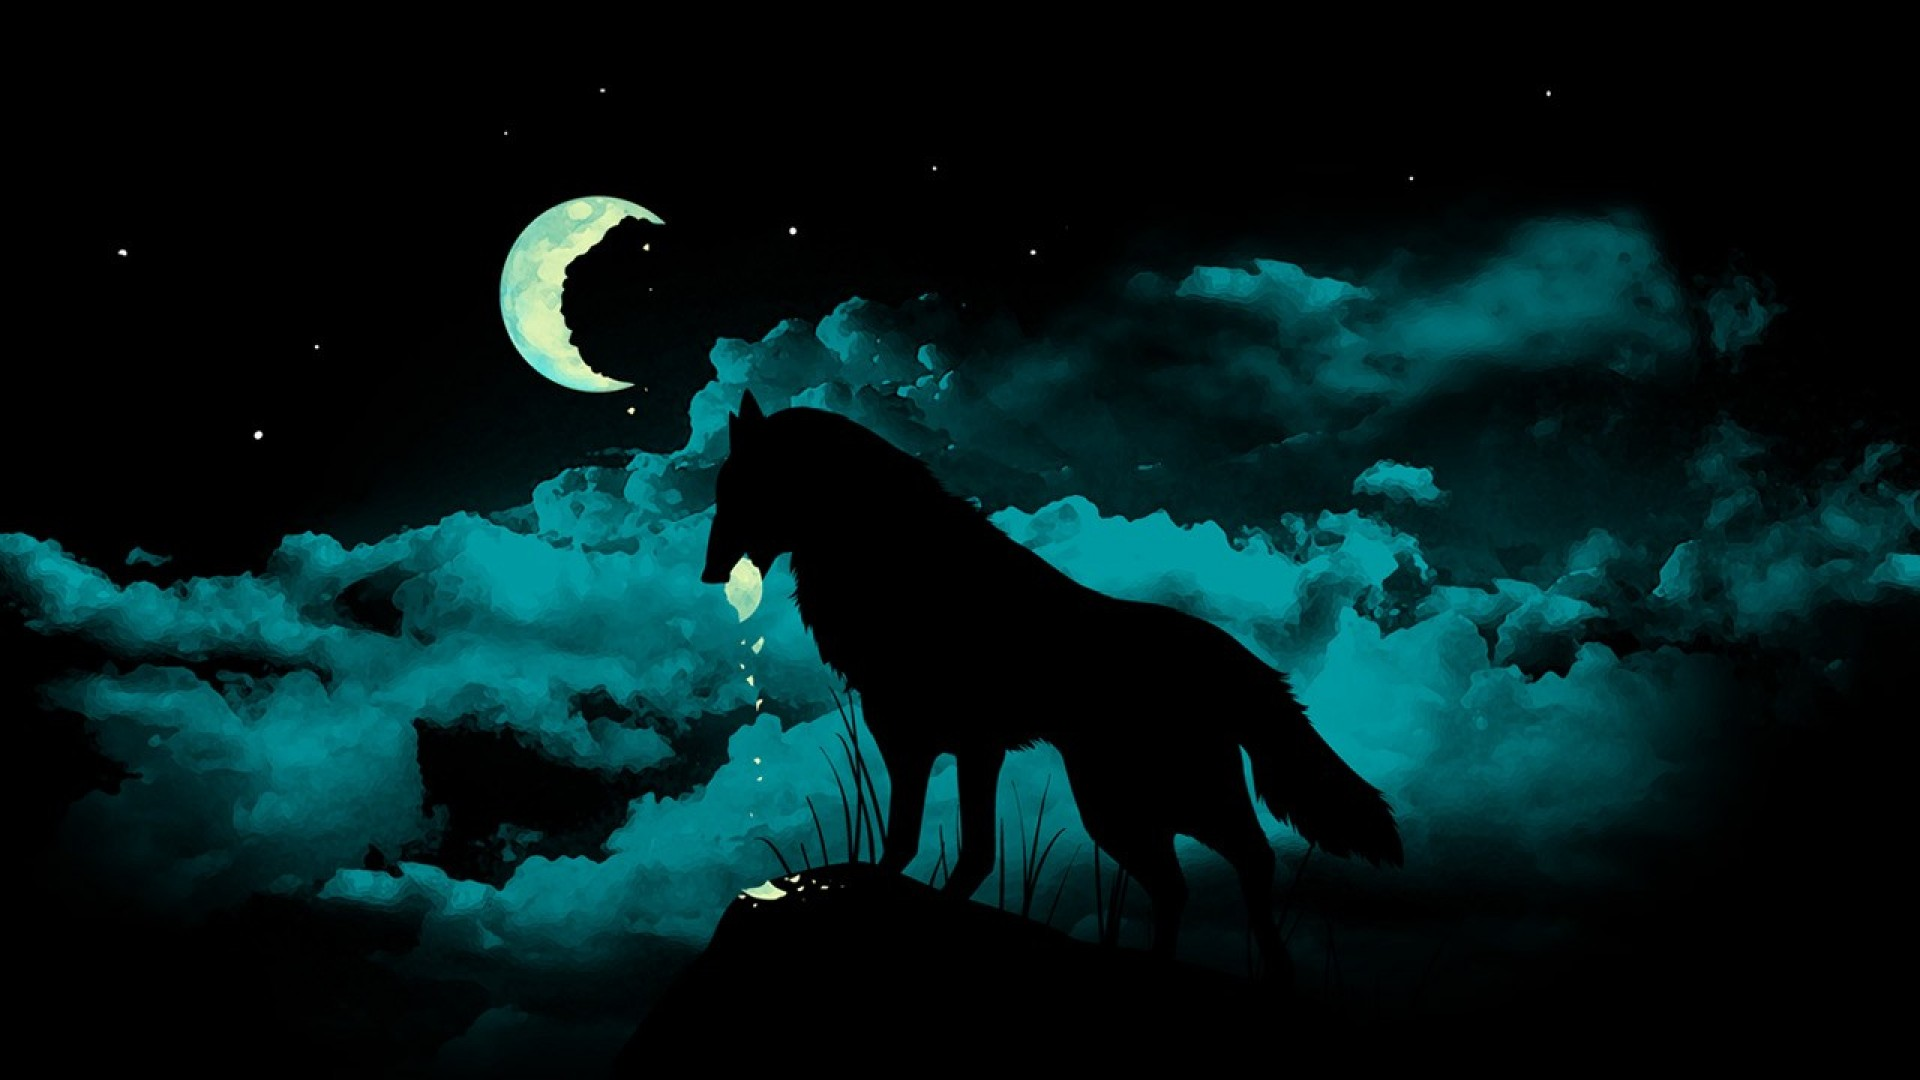 White Wolf Moon Wallpaper